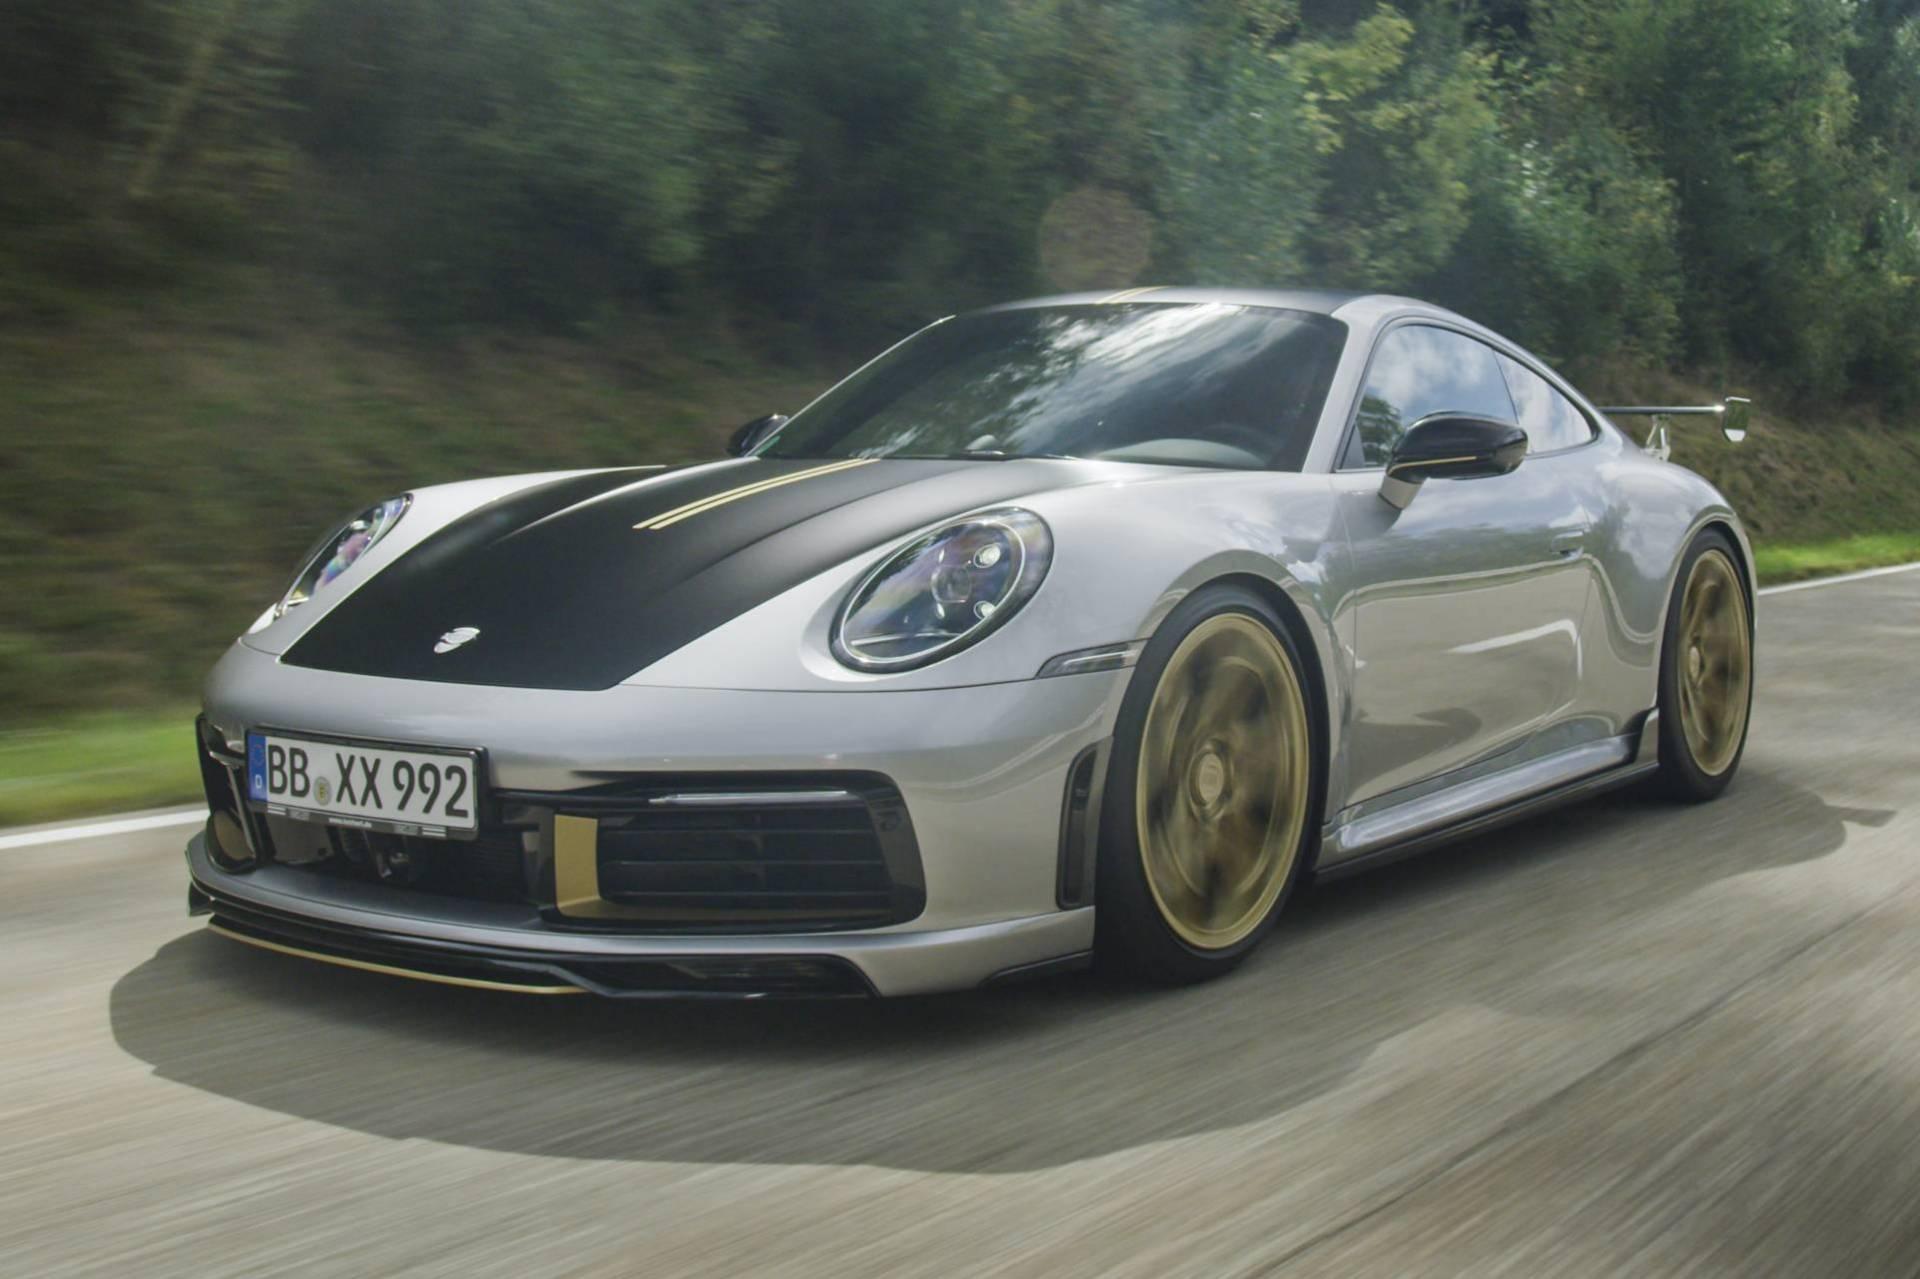 Chi tiet Porsche 911 2020 lot xac man nhan voi goi do thu cong hinh anh 52